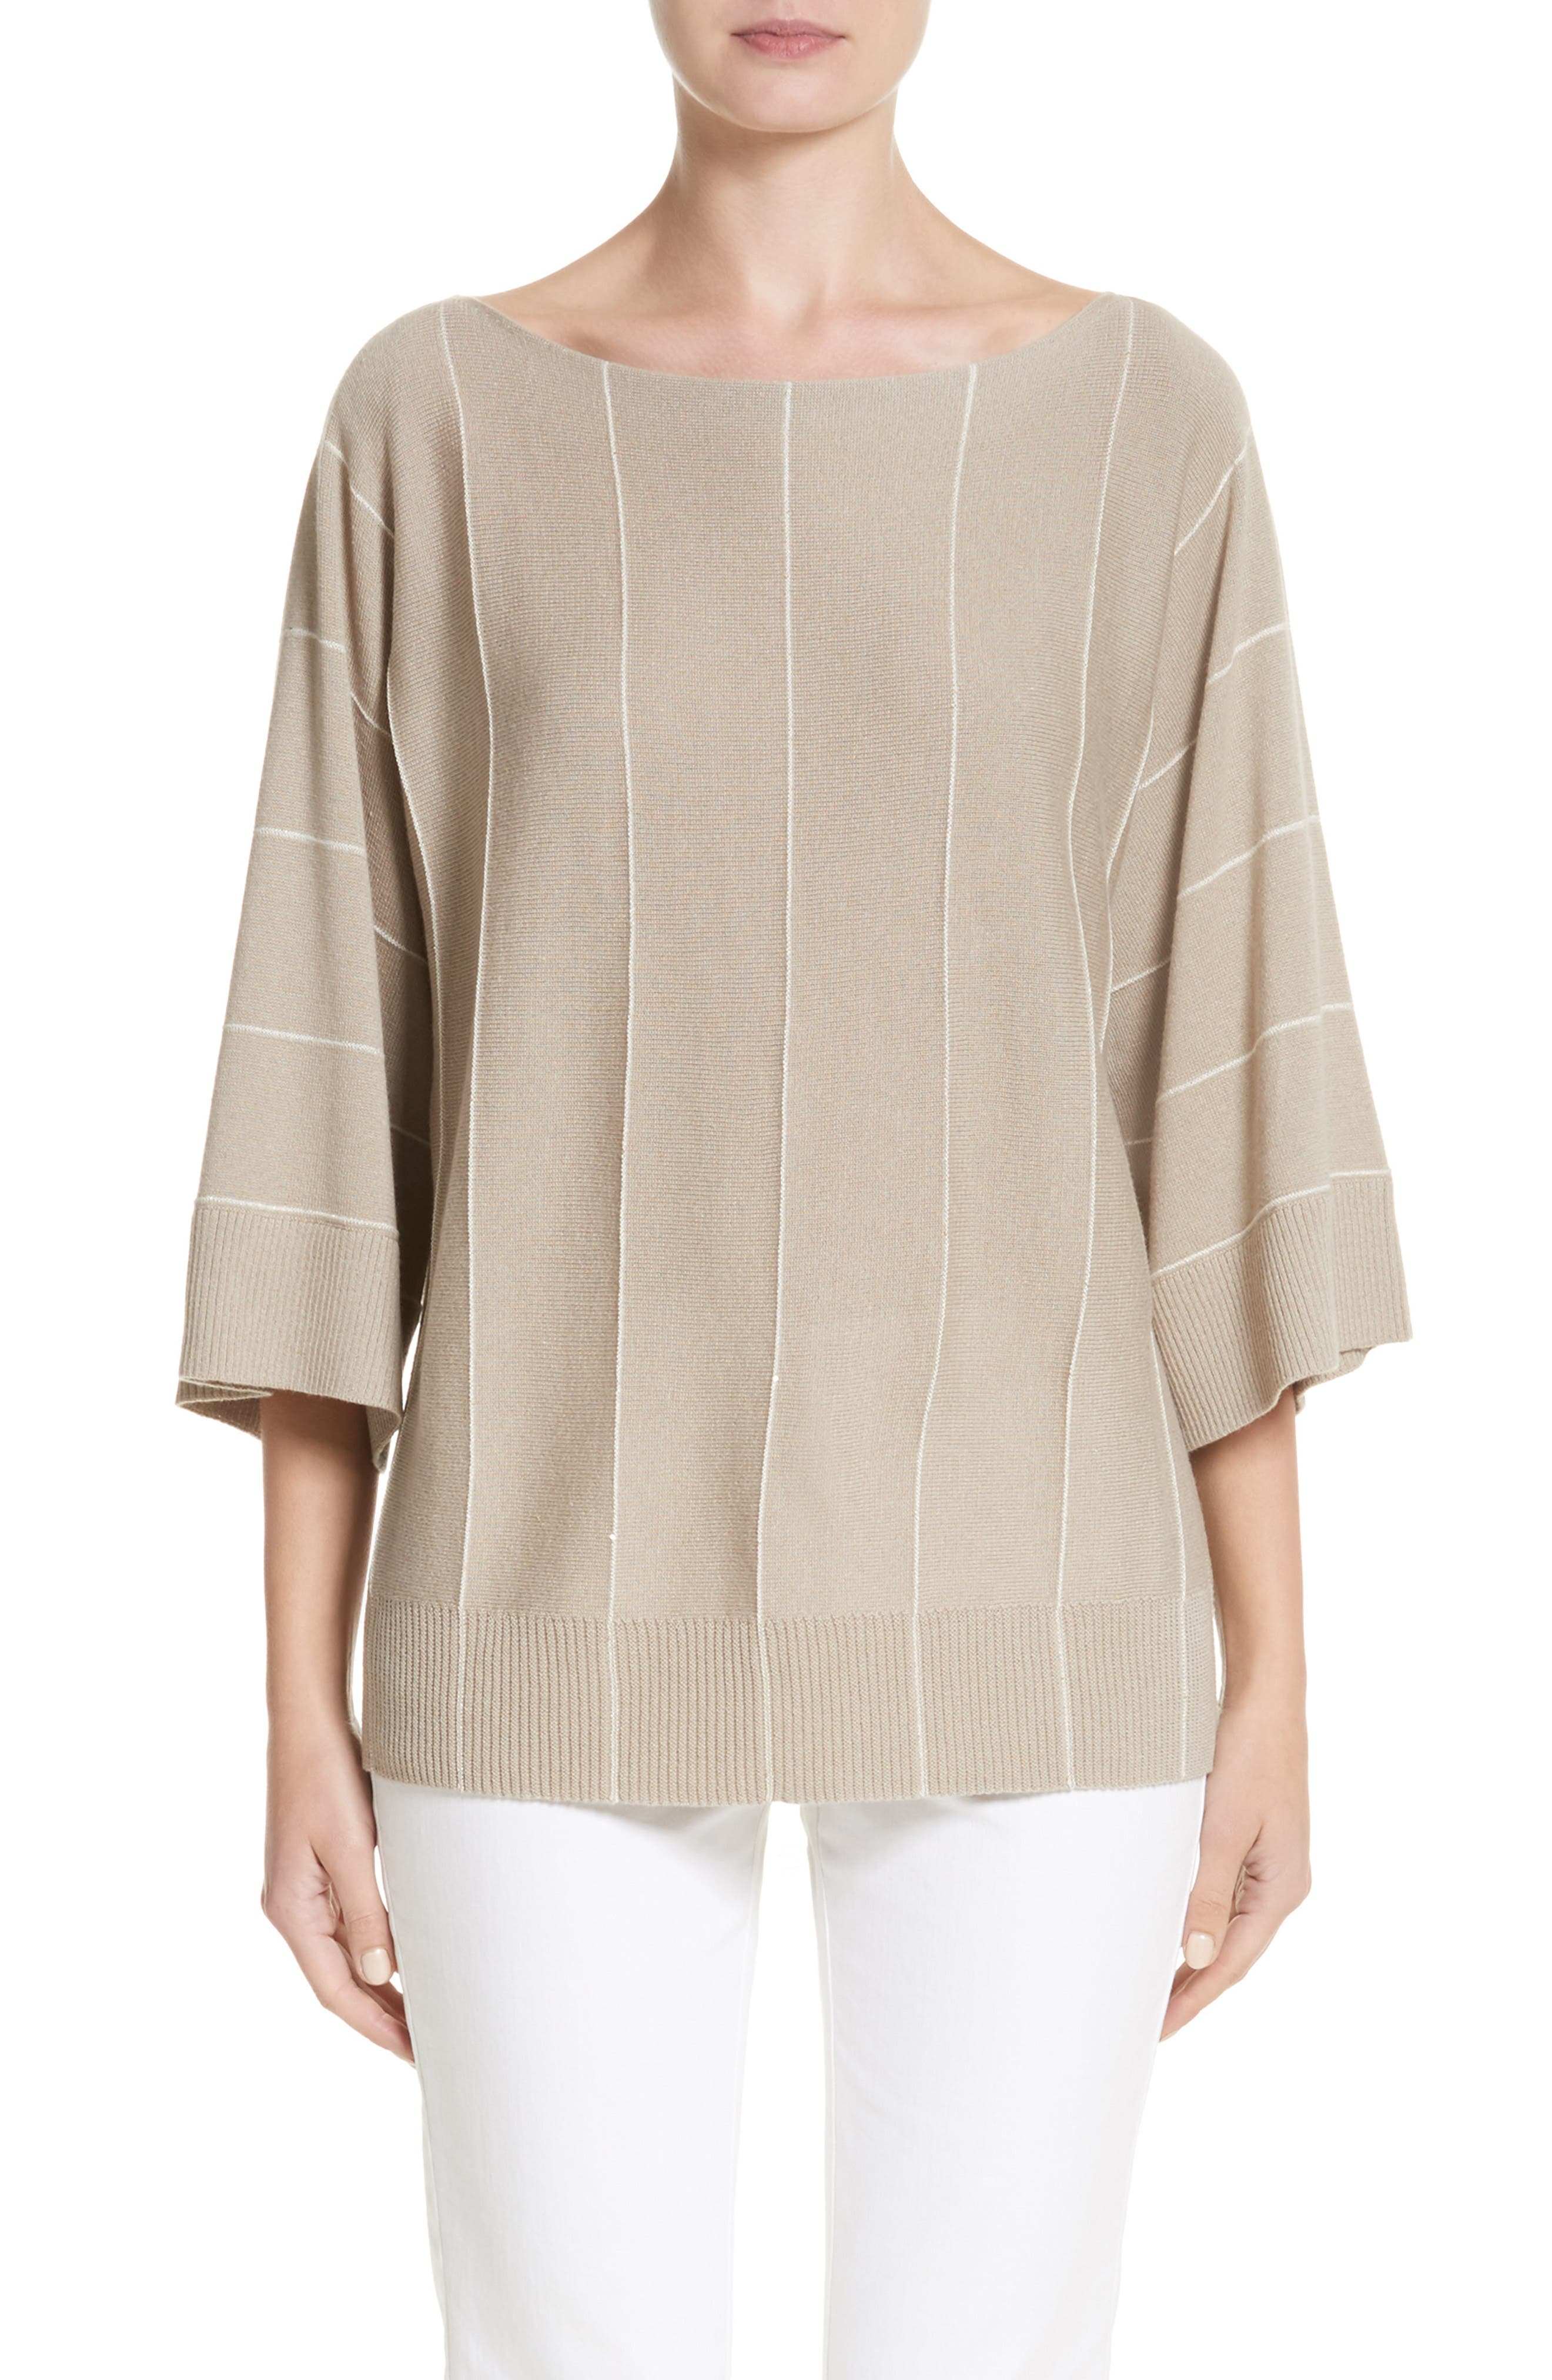 Lafayette 148 New York Sequin Knit Cashmere & Silk Pullover